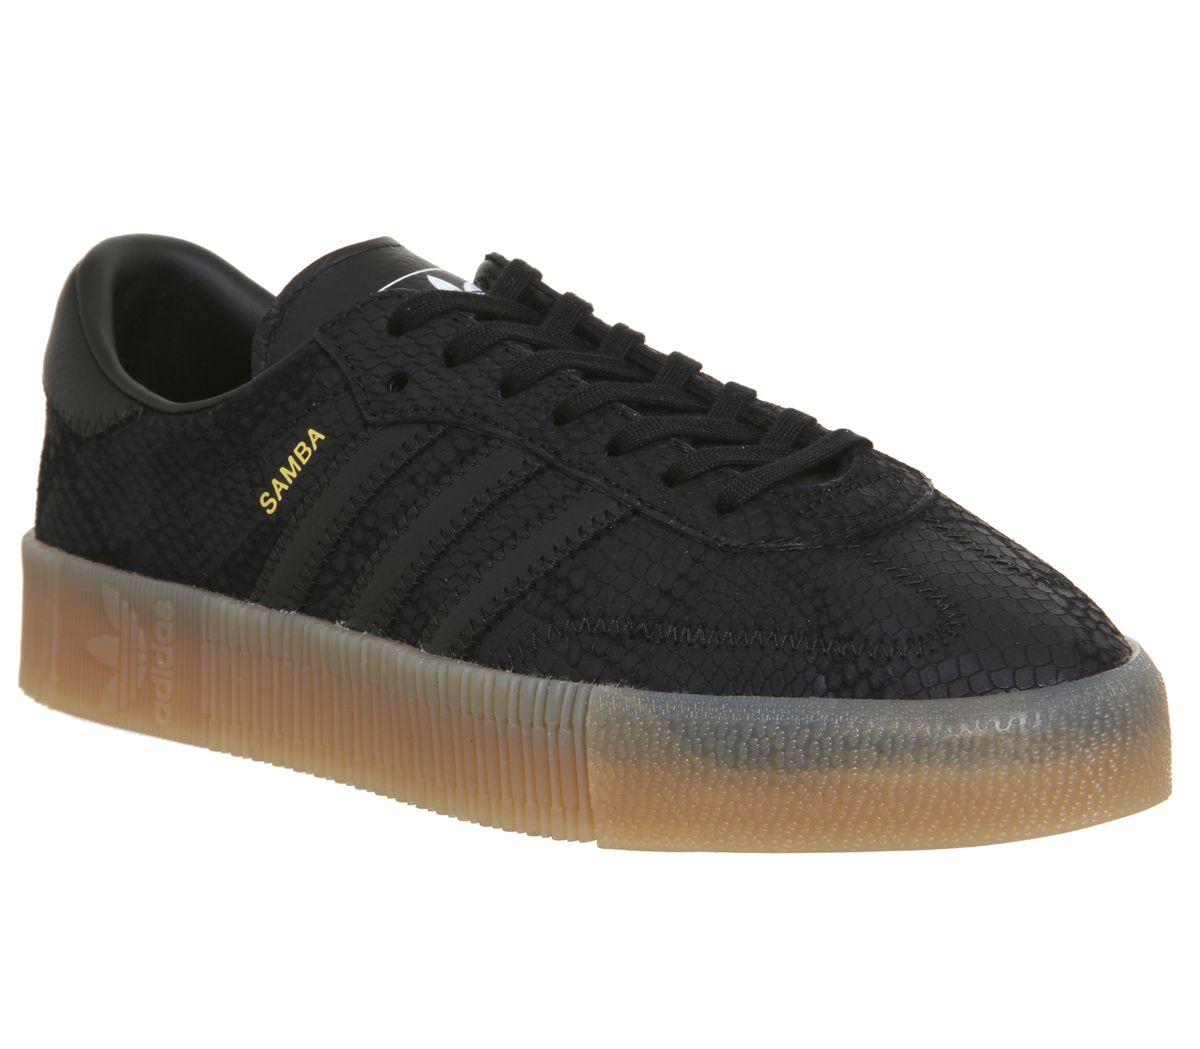 a8a6ea96f41e5 adidas Samba Rose Trainers Core Black Gum - Hers trainers